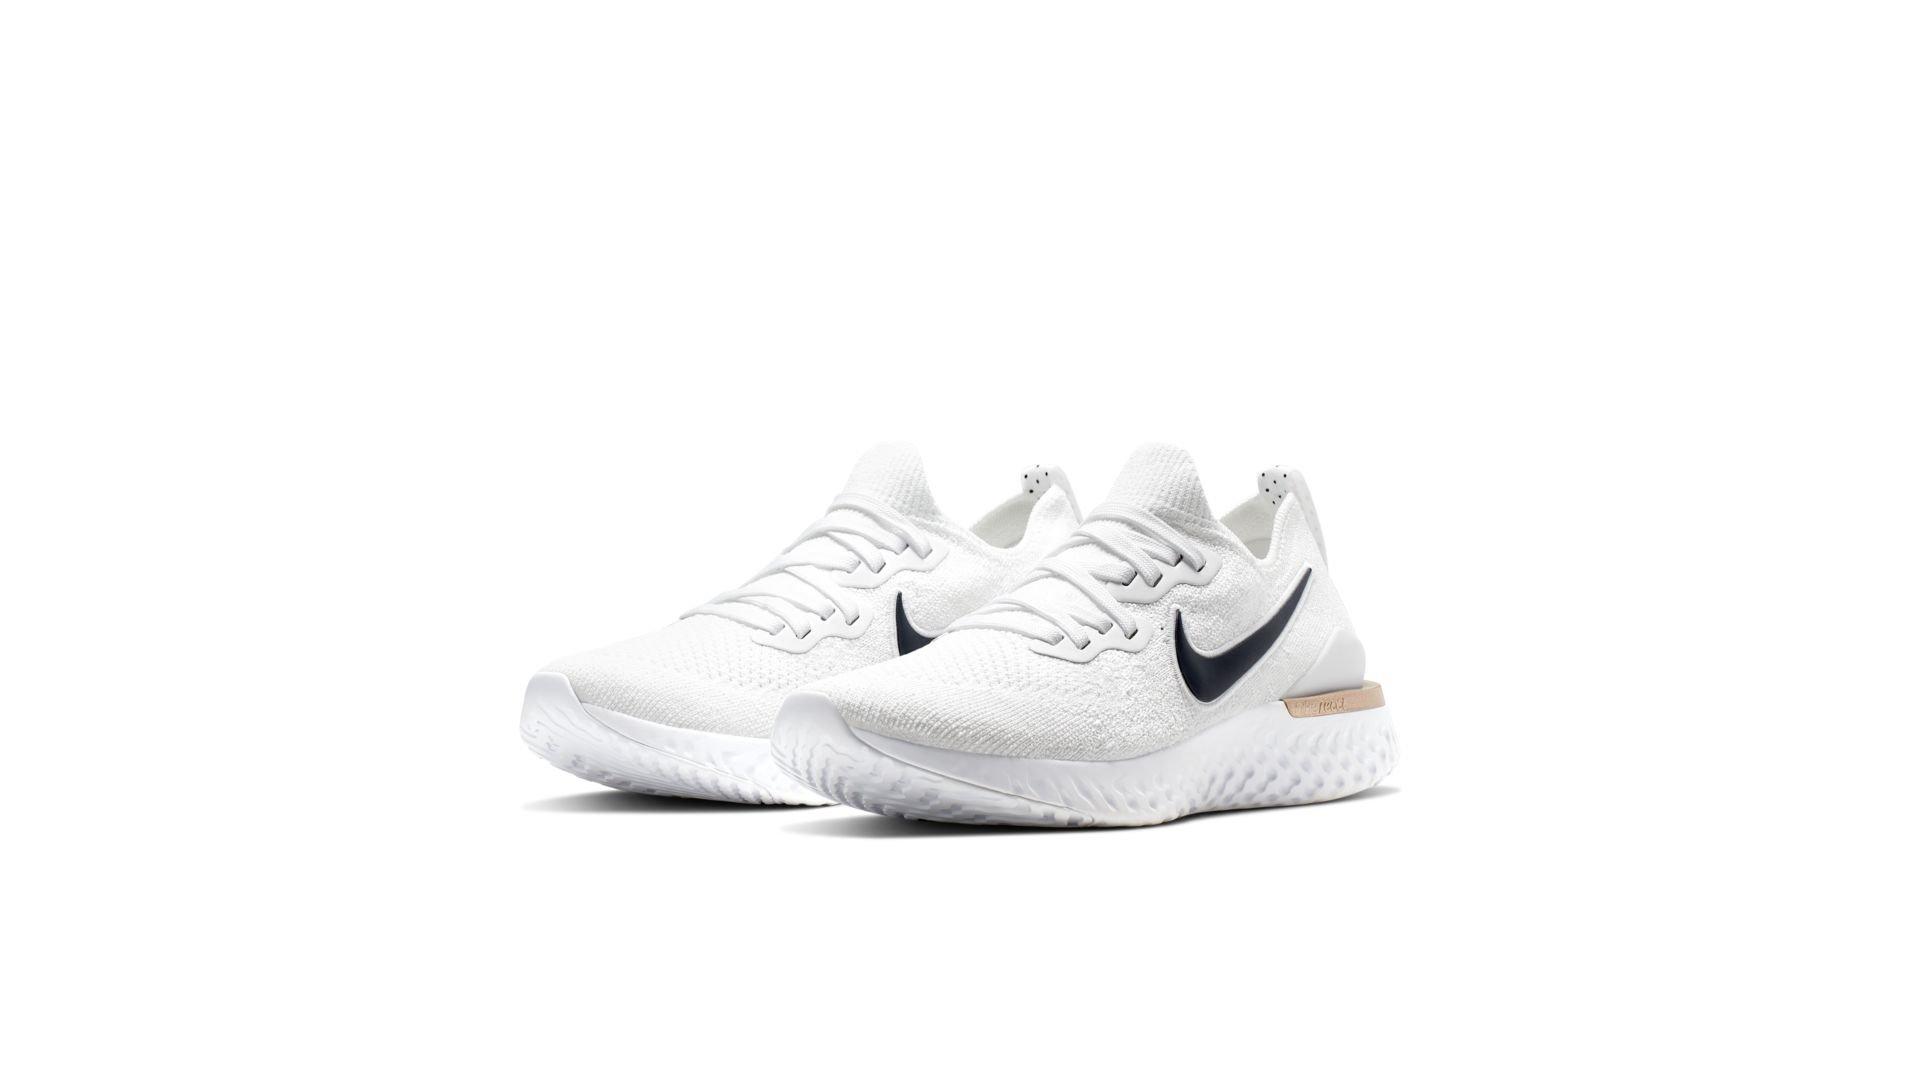 Nike Epic React Flyknit 2 Unite Totale (W) (CI9101-100)